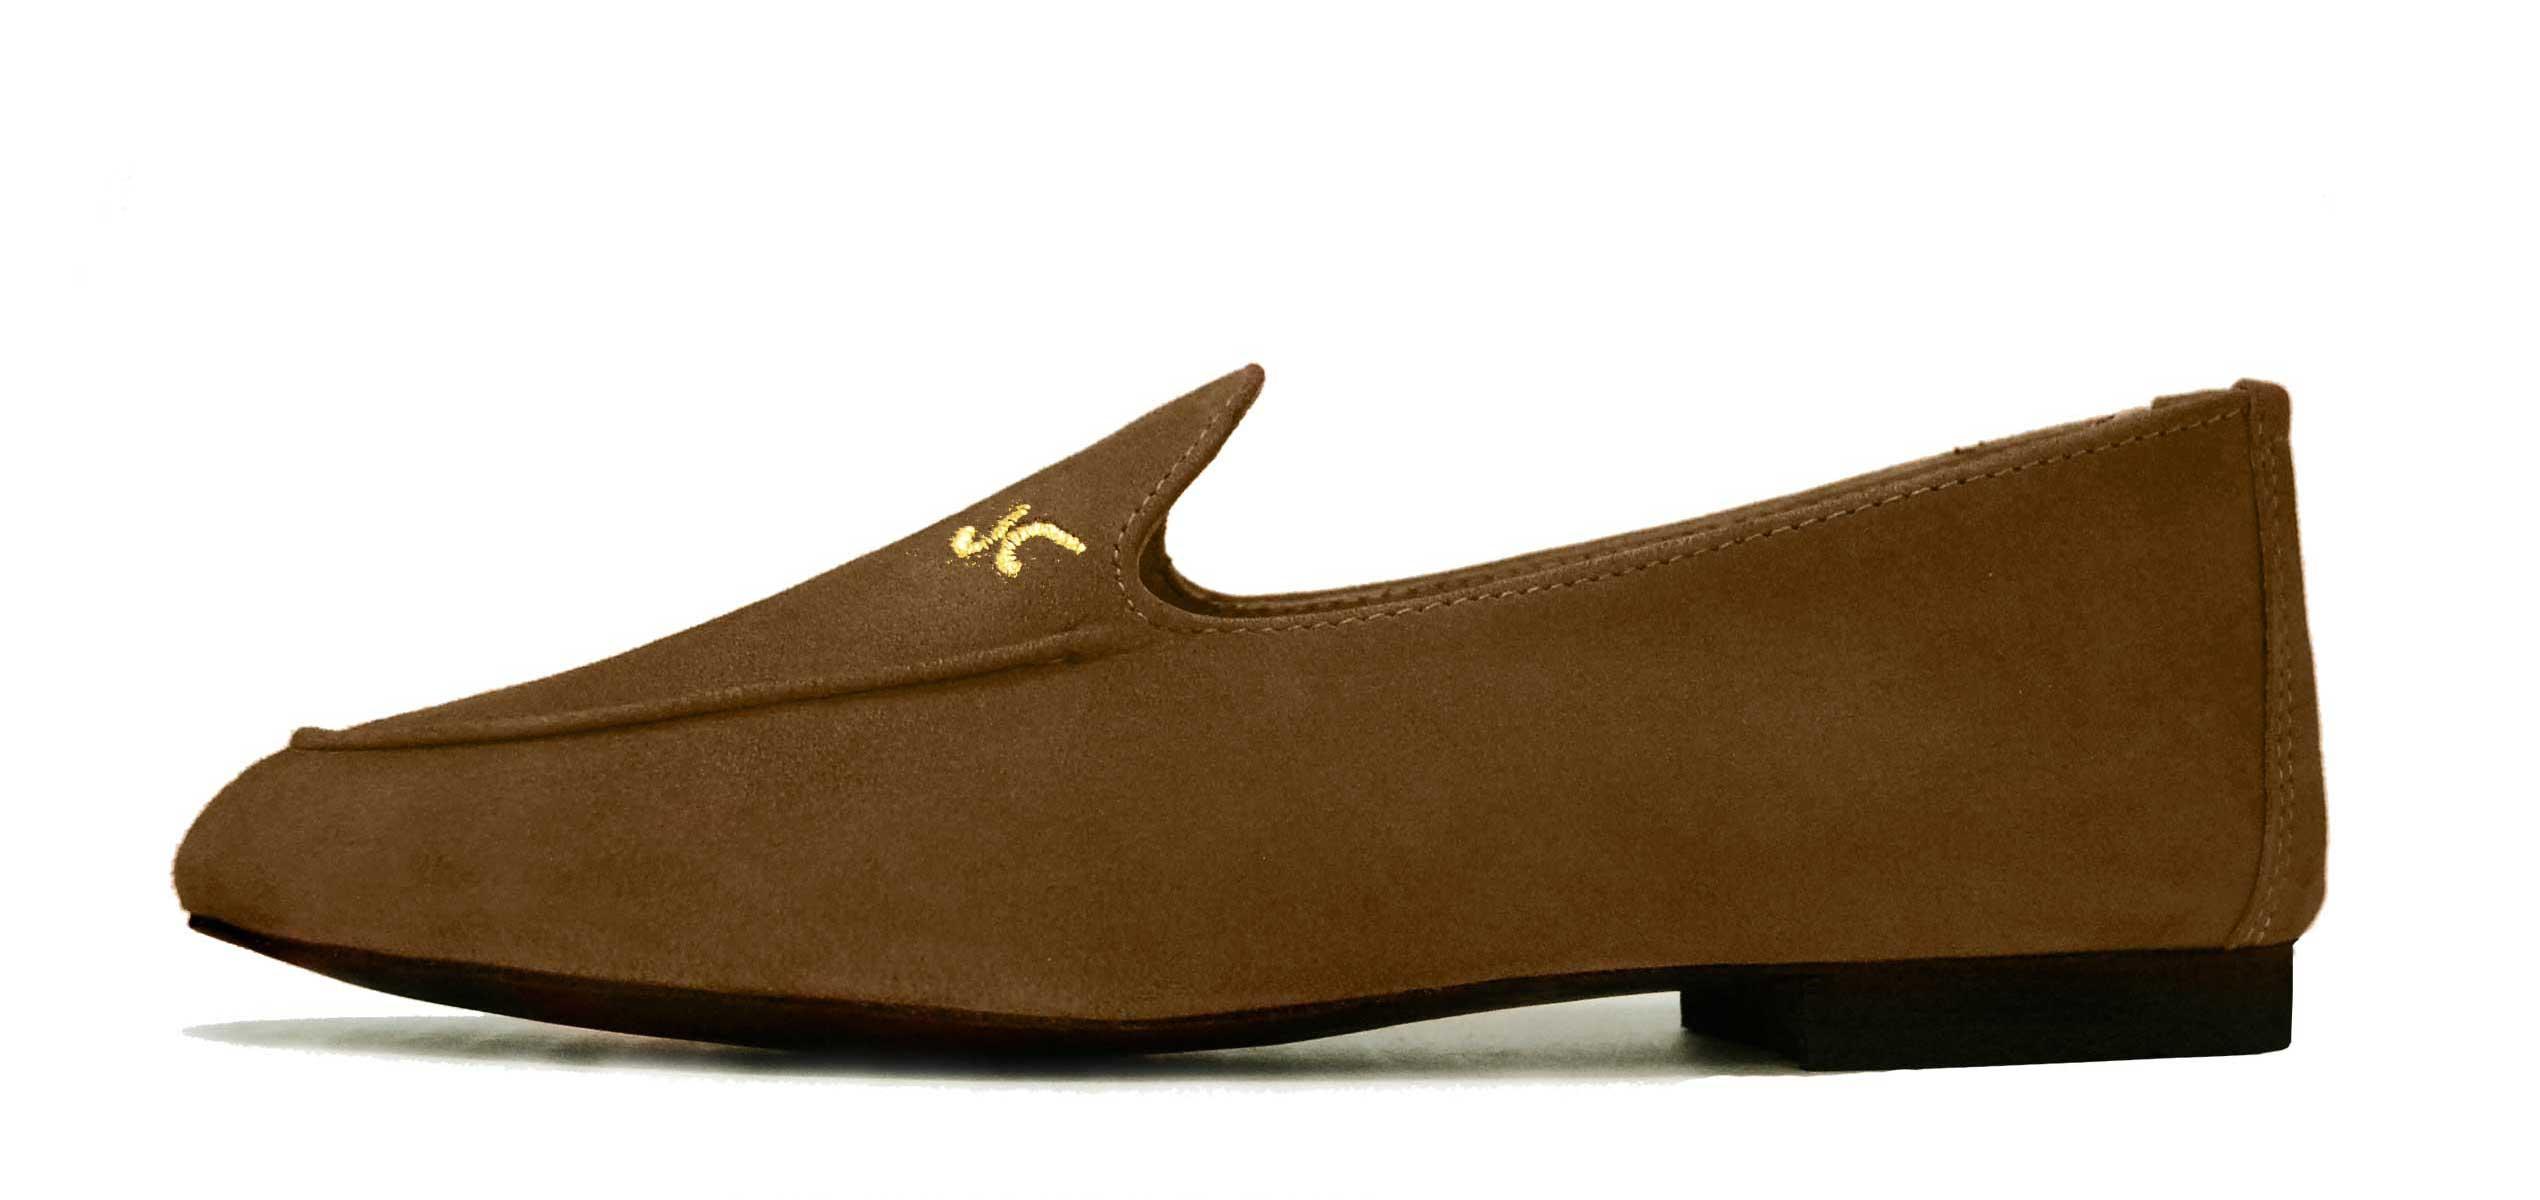 Foto 1 de Zapatos Julio Iglesias Mocasin Moka ante